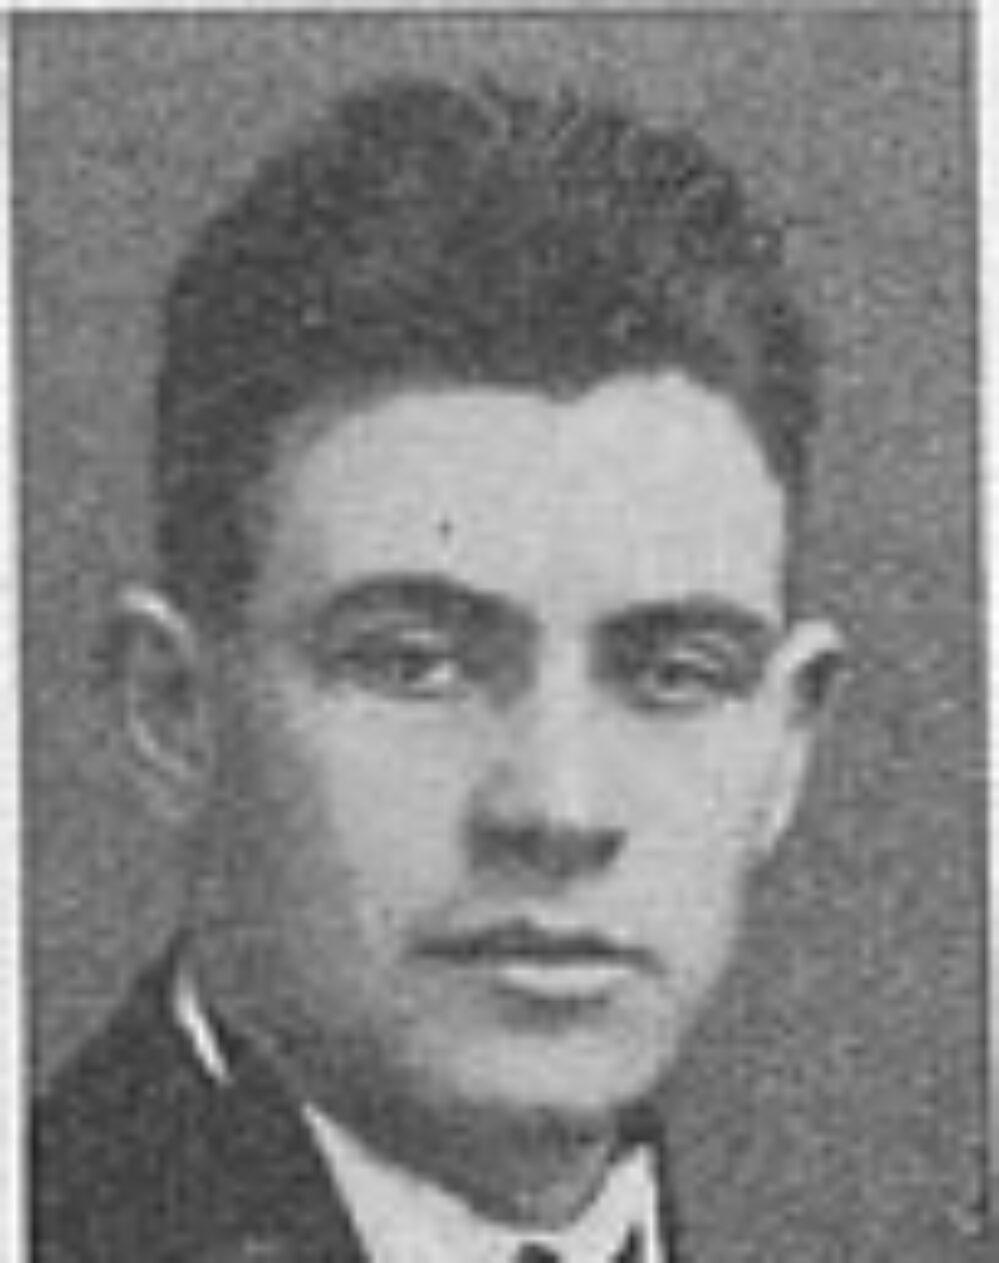 Olav Johan Bøe